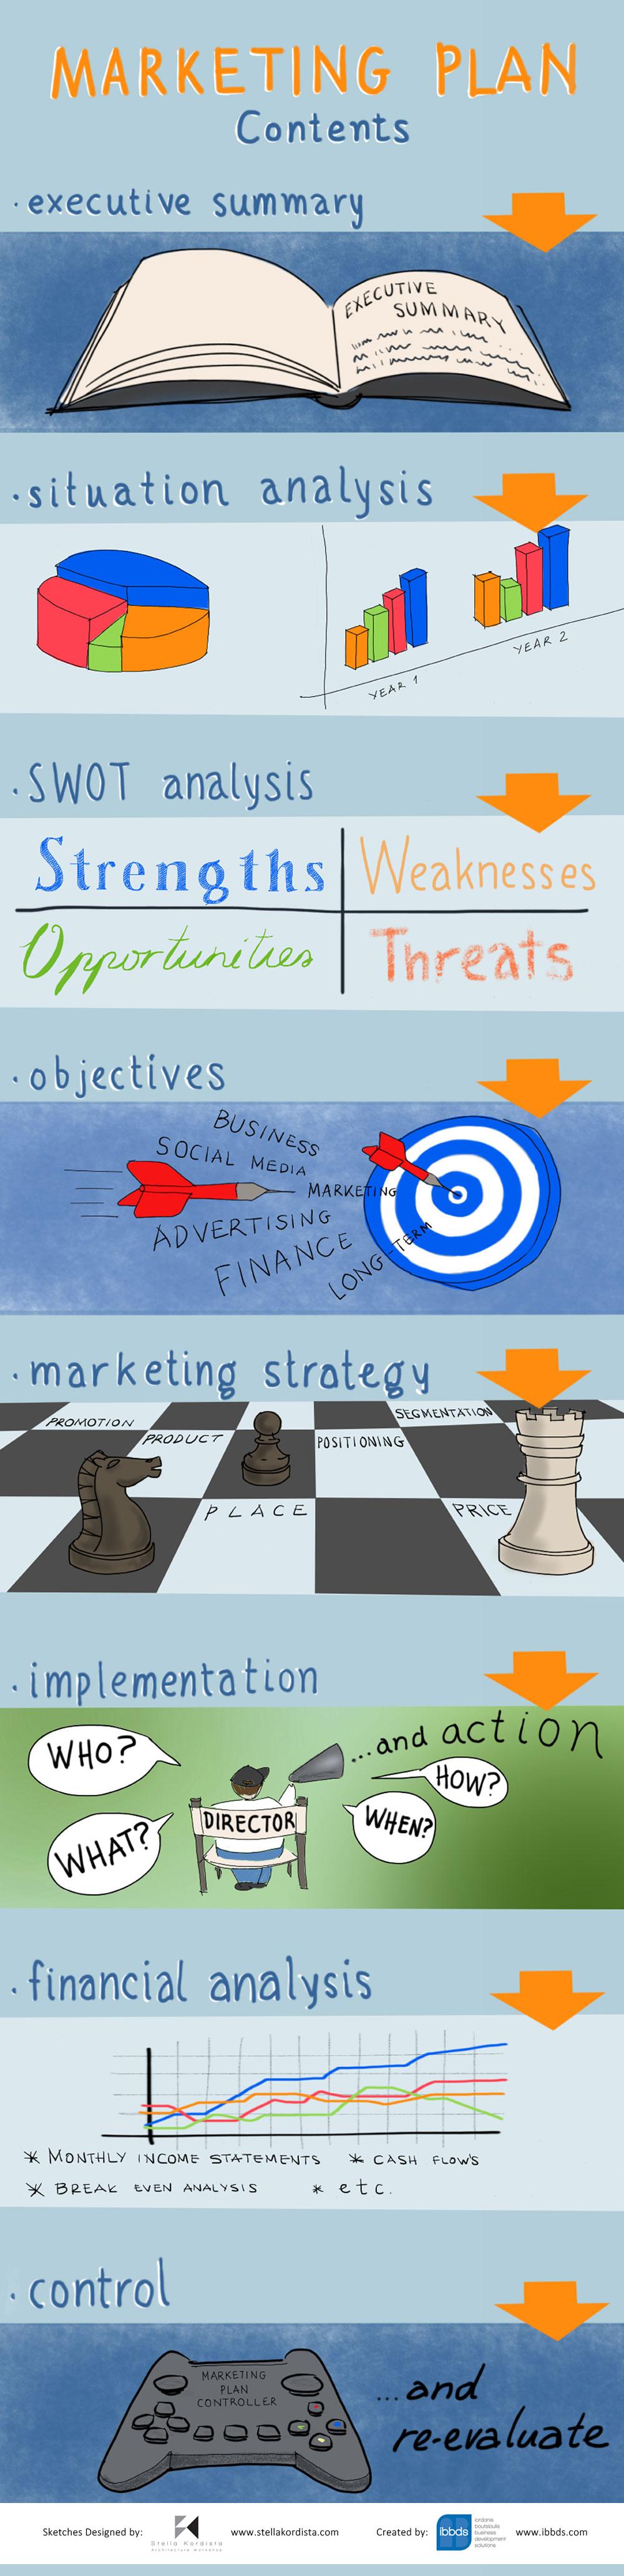 Marketing Plan Infographic